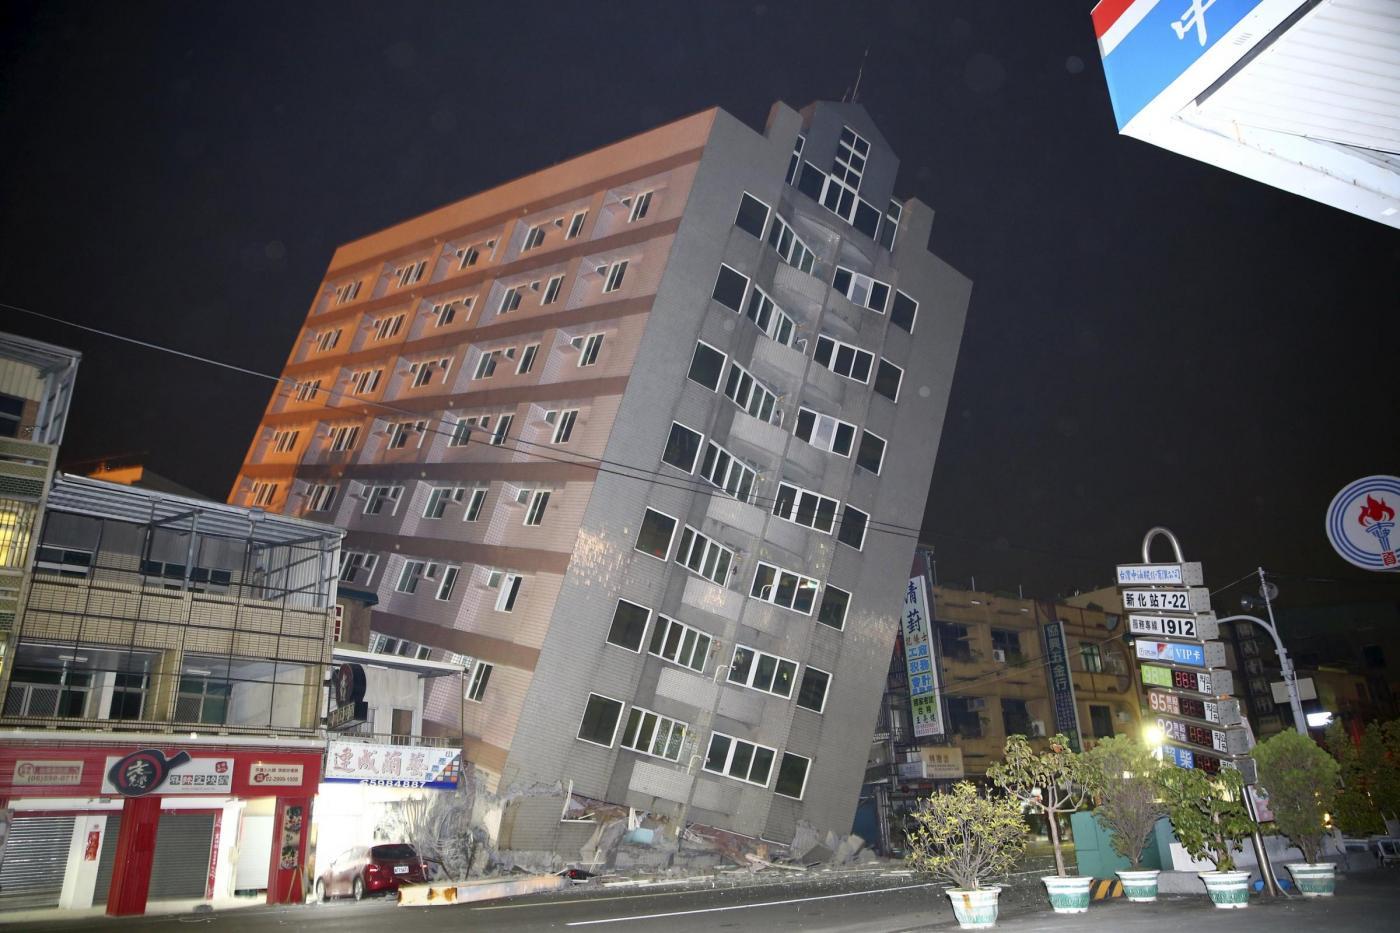 Violento terremoto in Taiwan, crollano palazzi